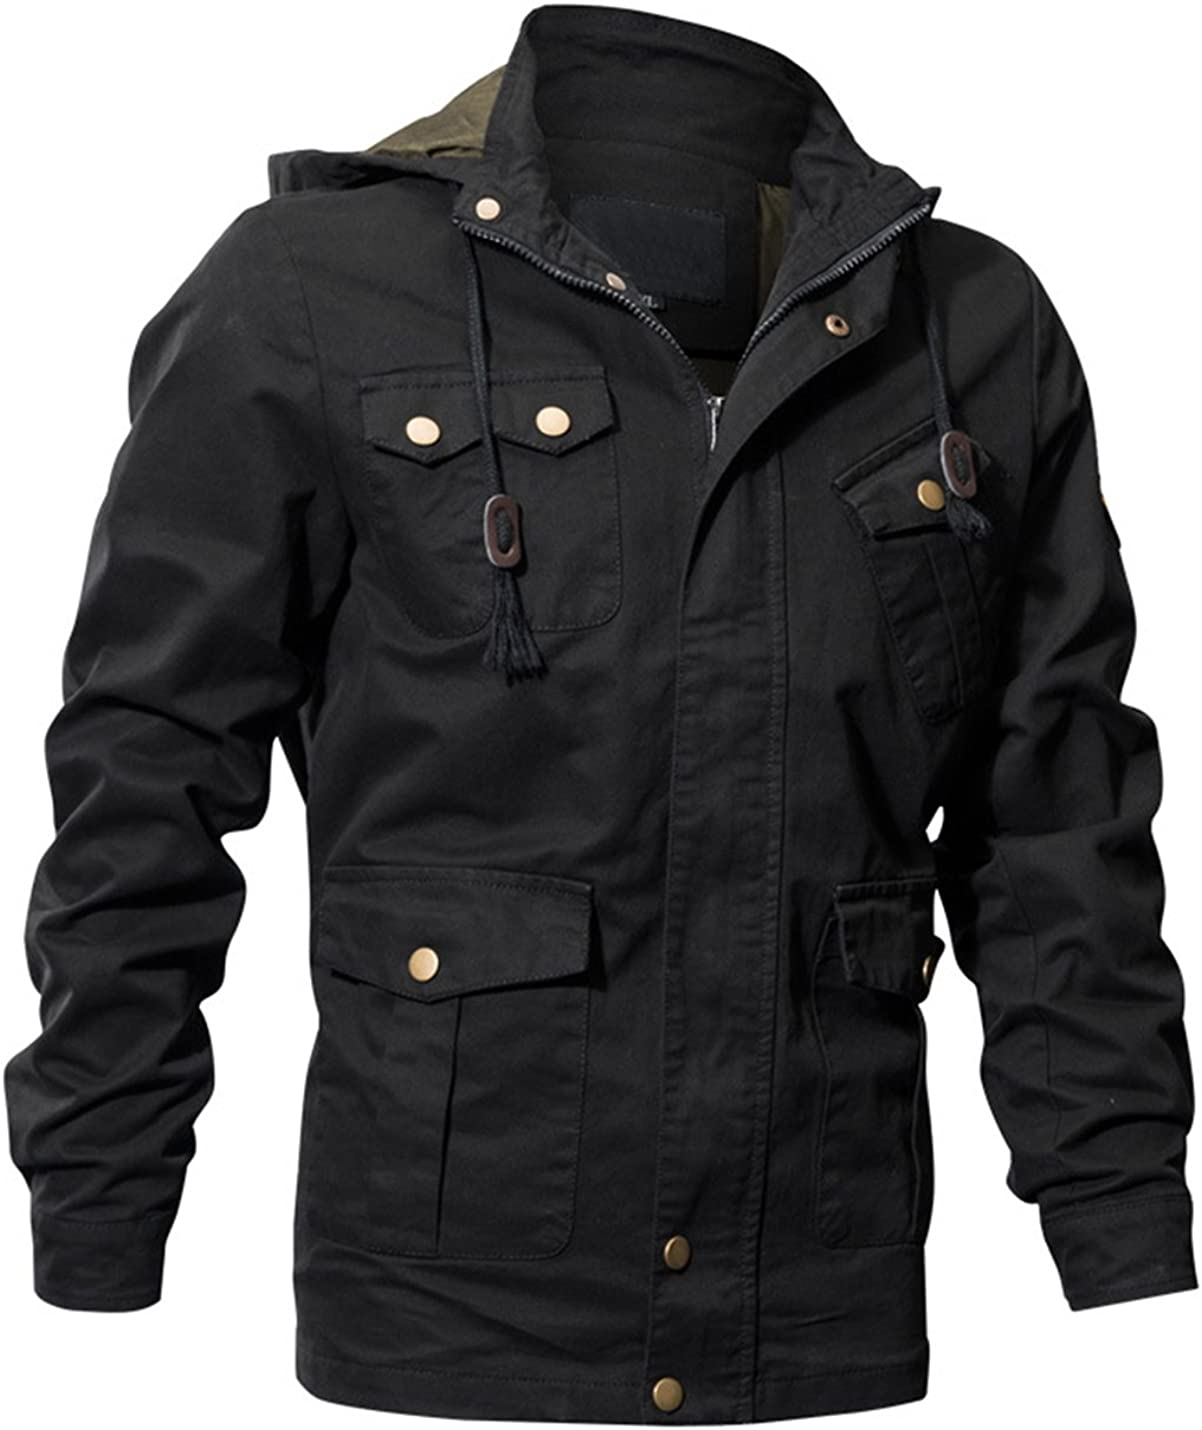 Lentta Men's Colorado Springs Mall Casual Multi Pockets Military Outdoor Cotton Zipper Sales results No. 1